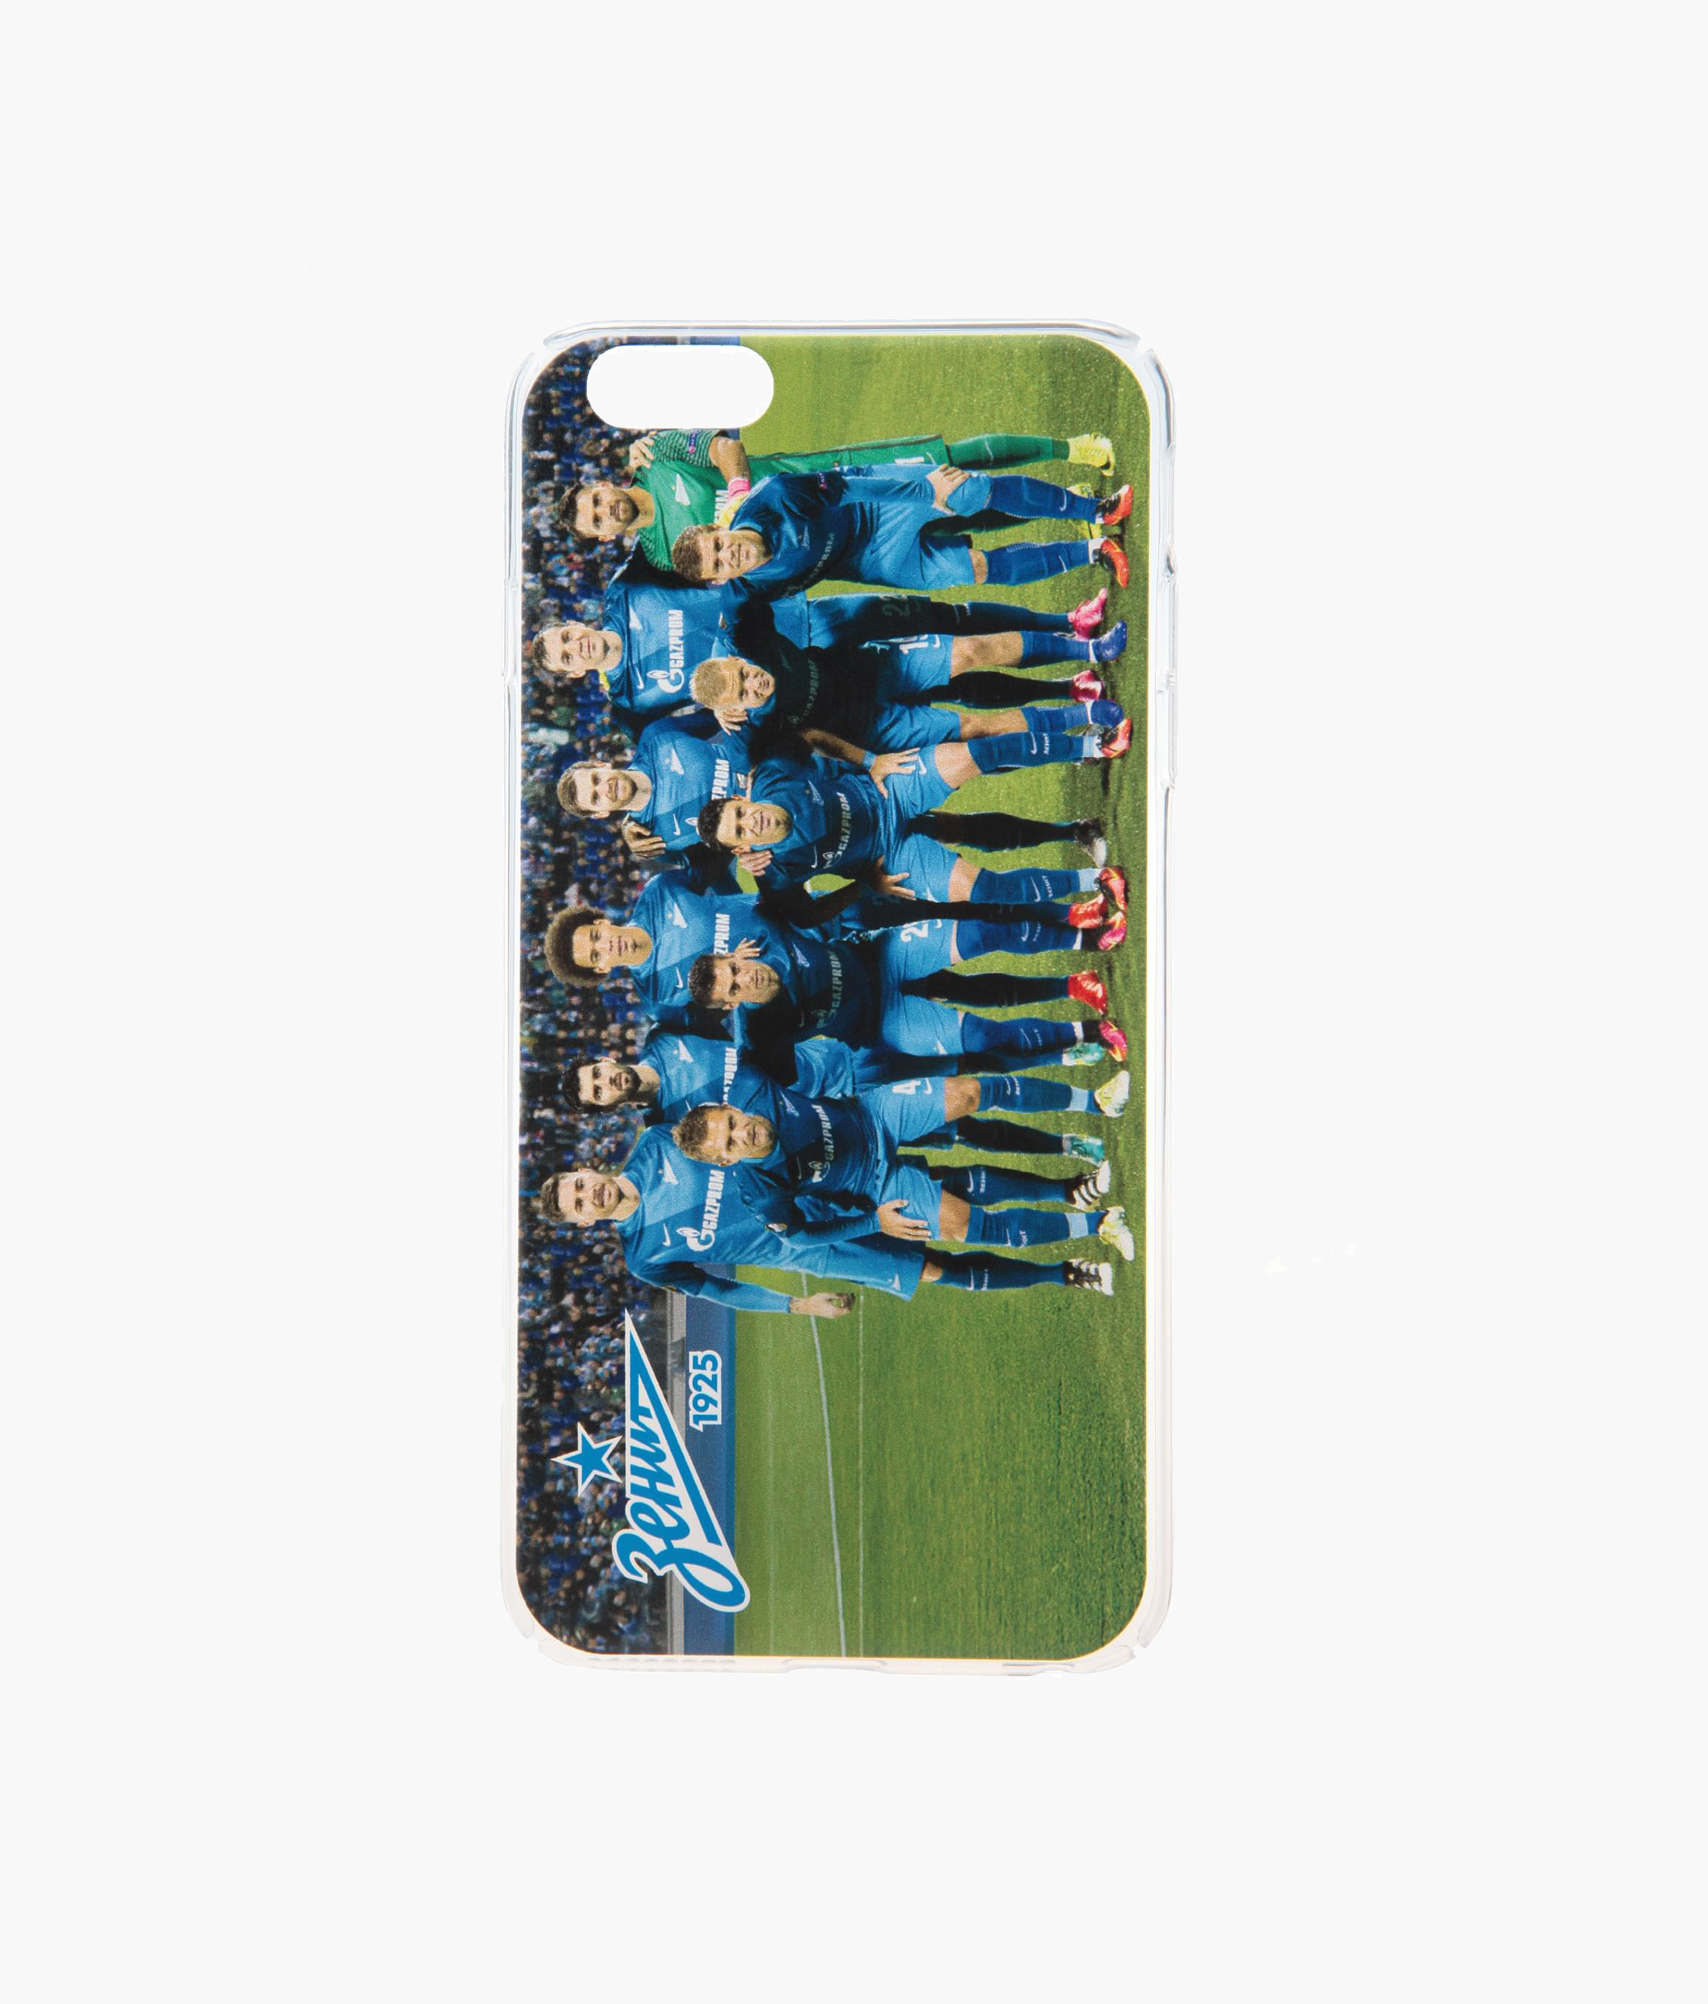 Фото - Чехол для IPhone 6/6S Plus «Команда 2016/17» Зенит чехол